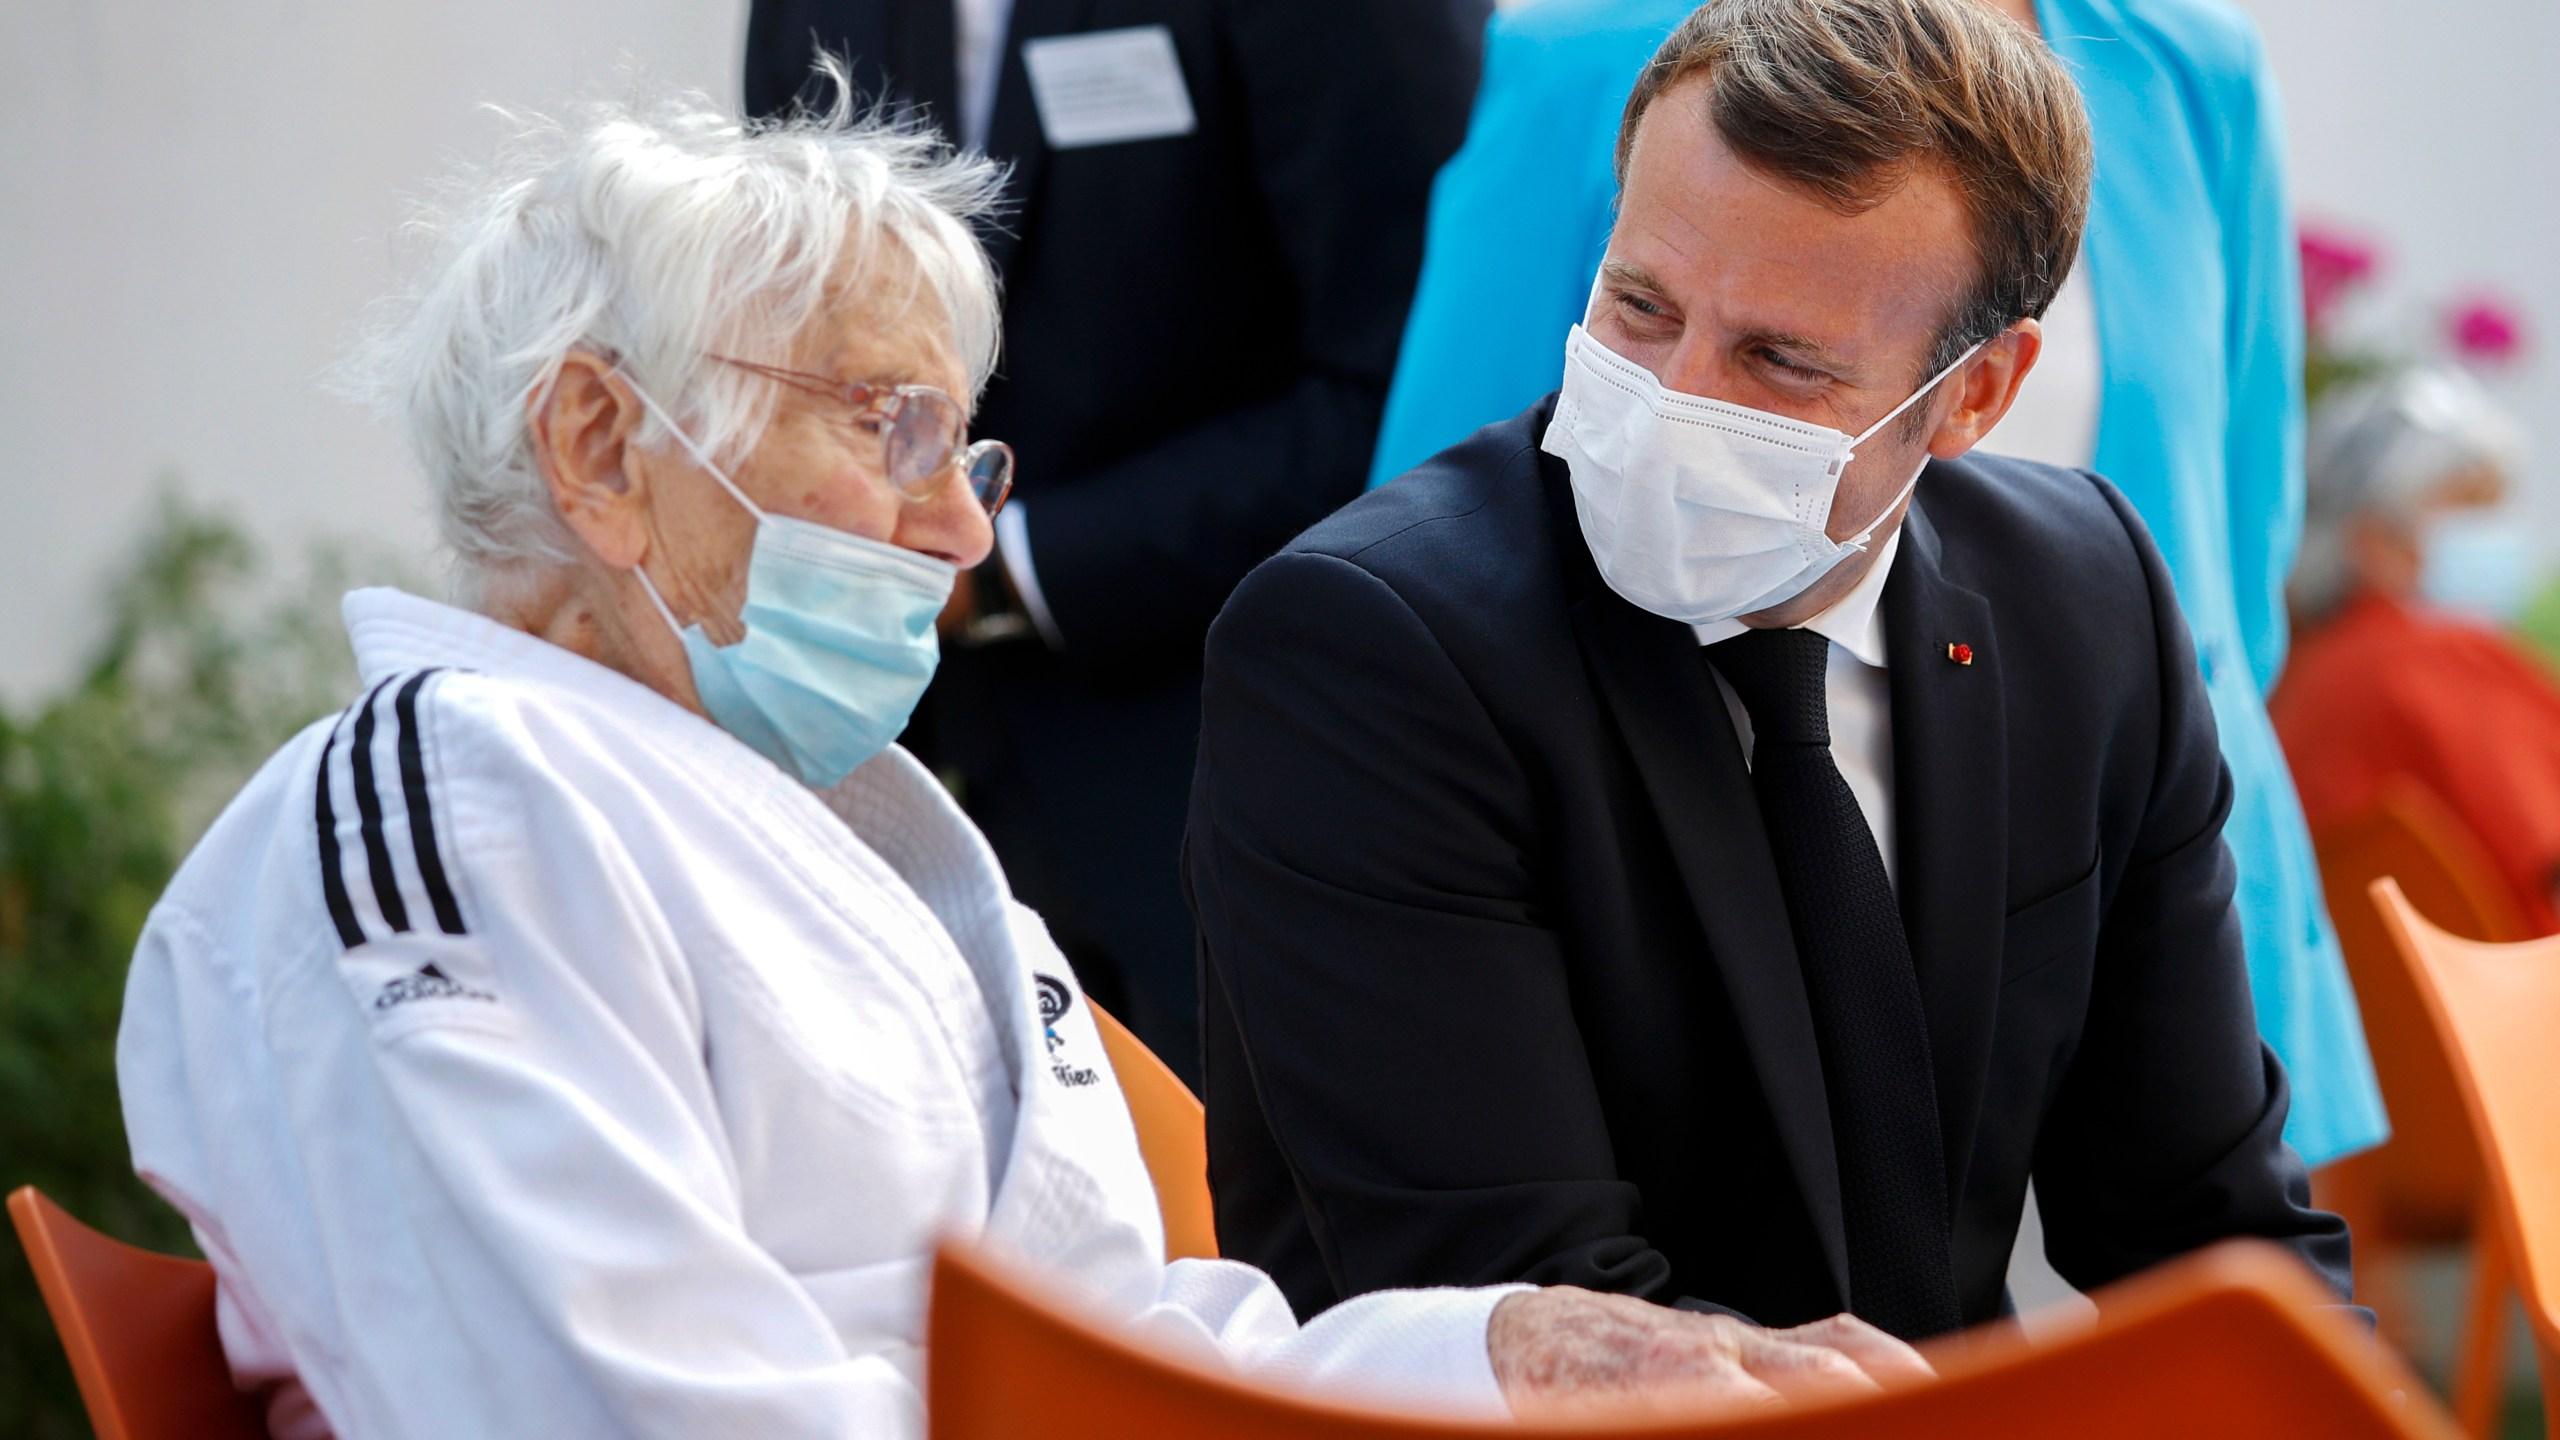 Emmanuel Macron at a retirement home